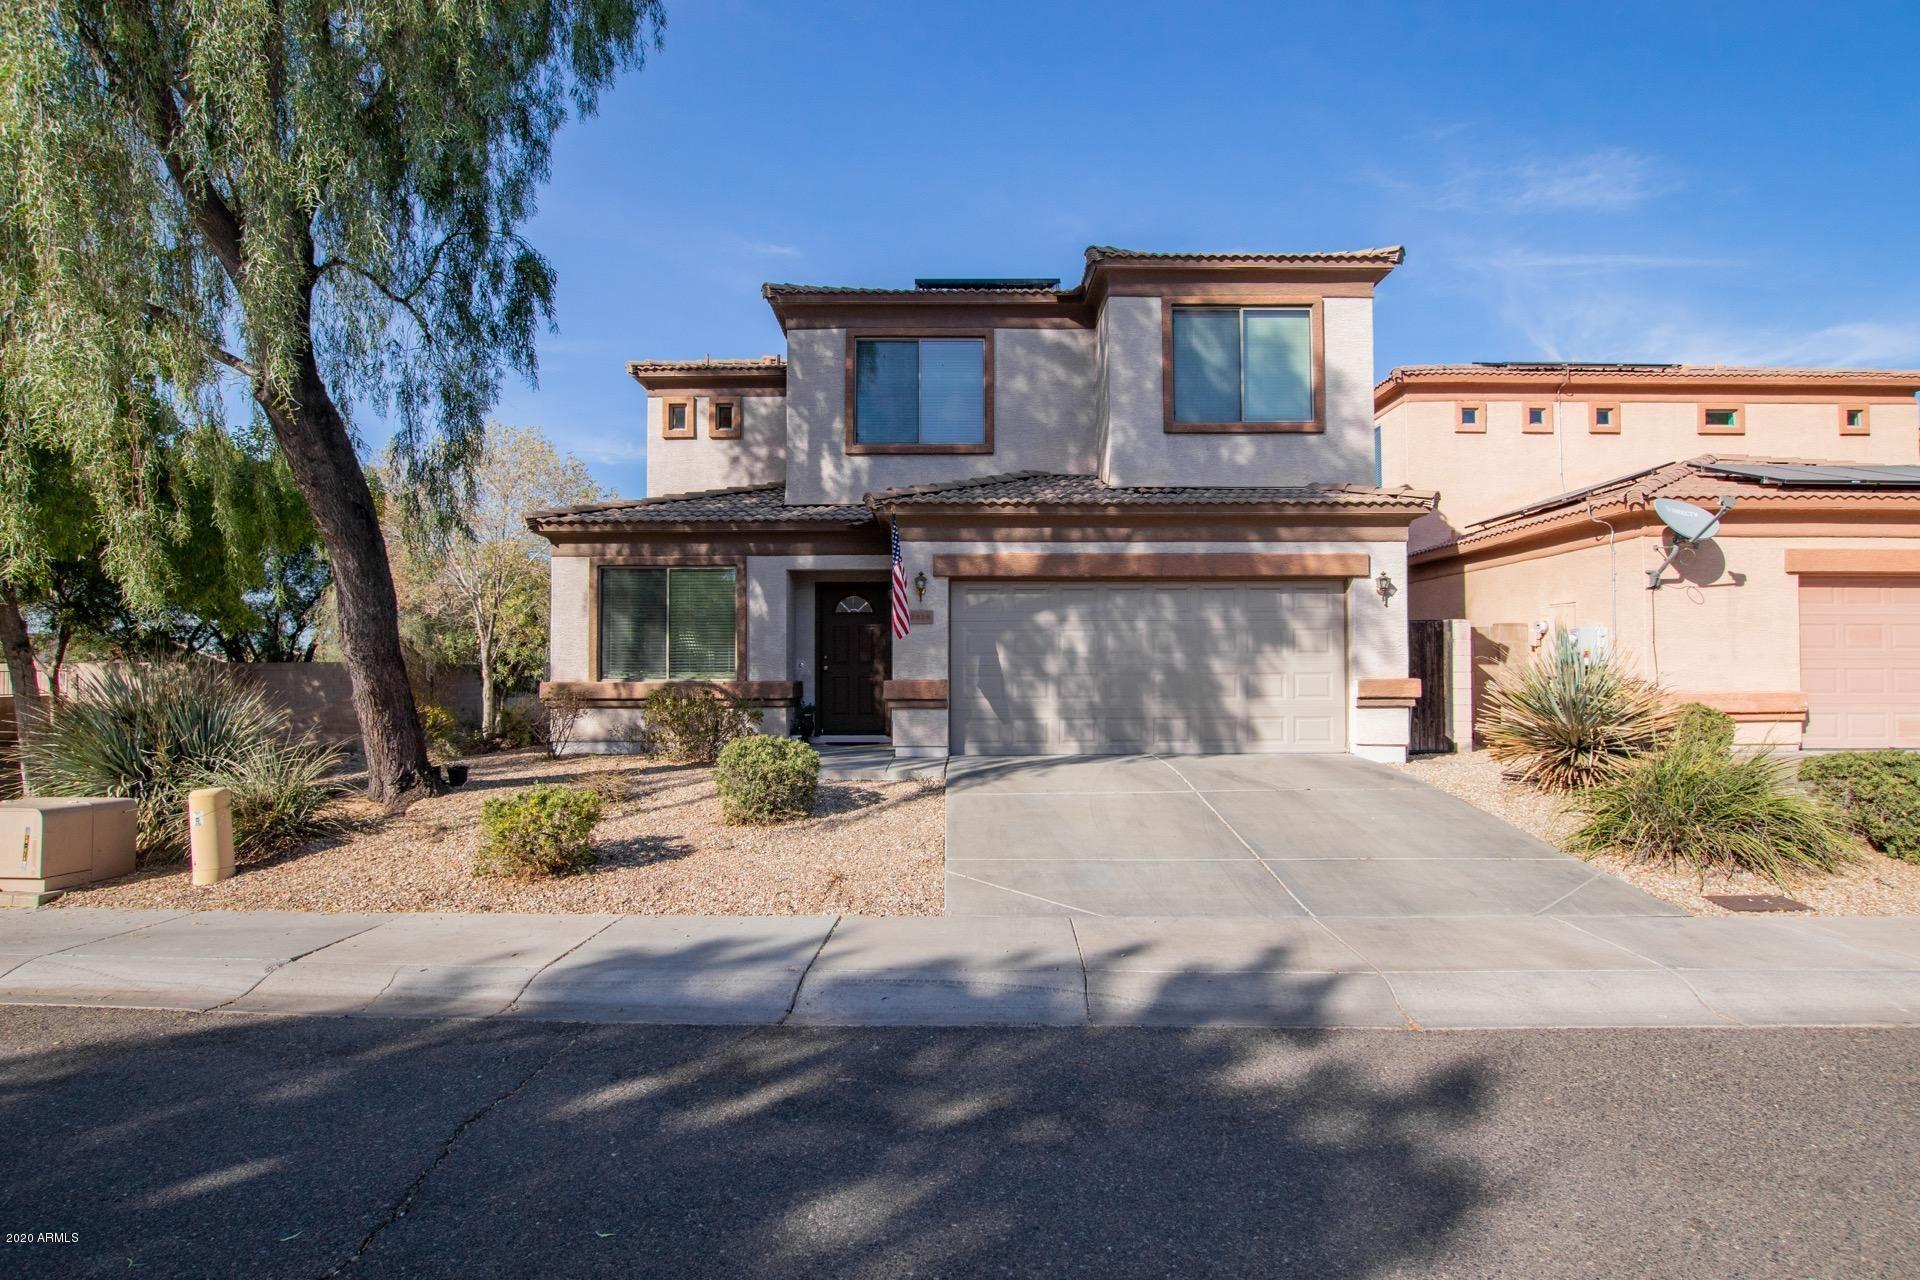 3626 W MARCONI Avenue, Phoenix, AZ 85053 - MLS#: 6157245